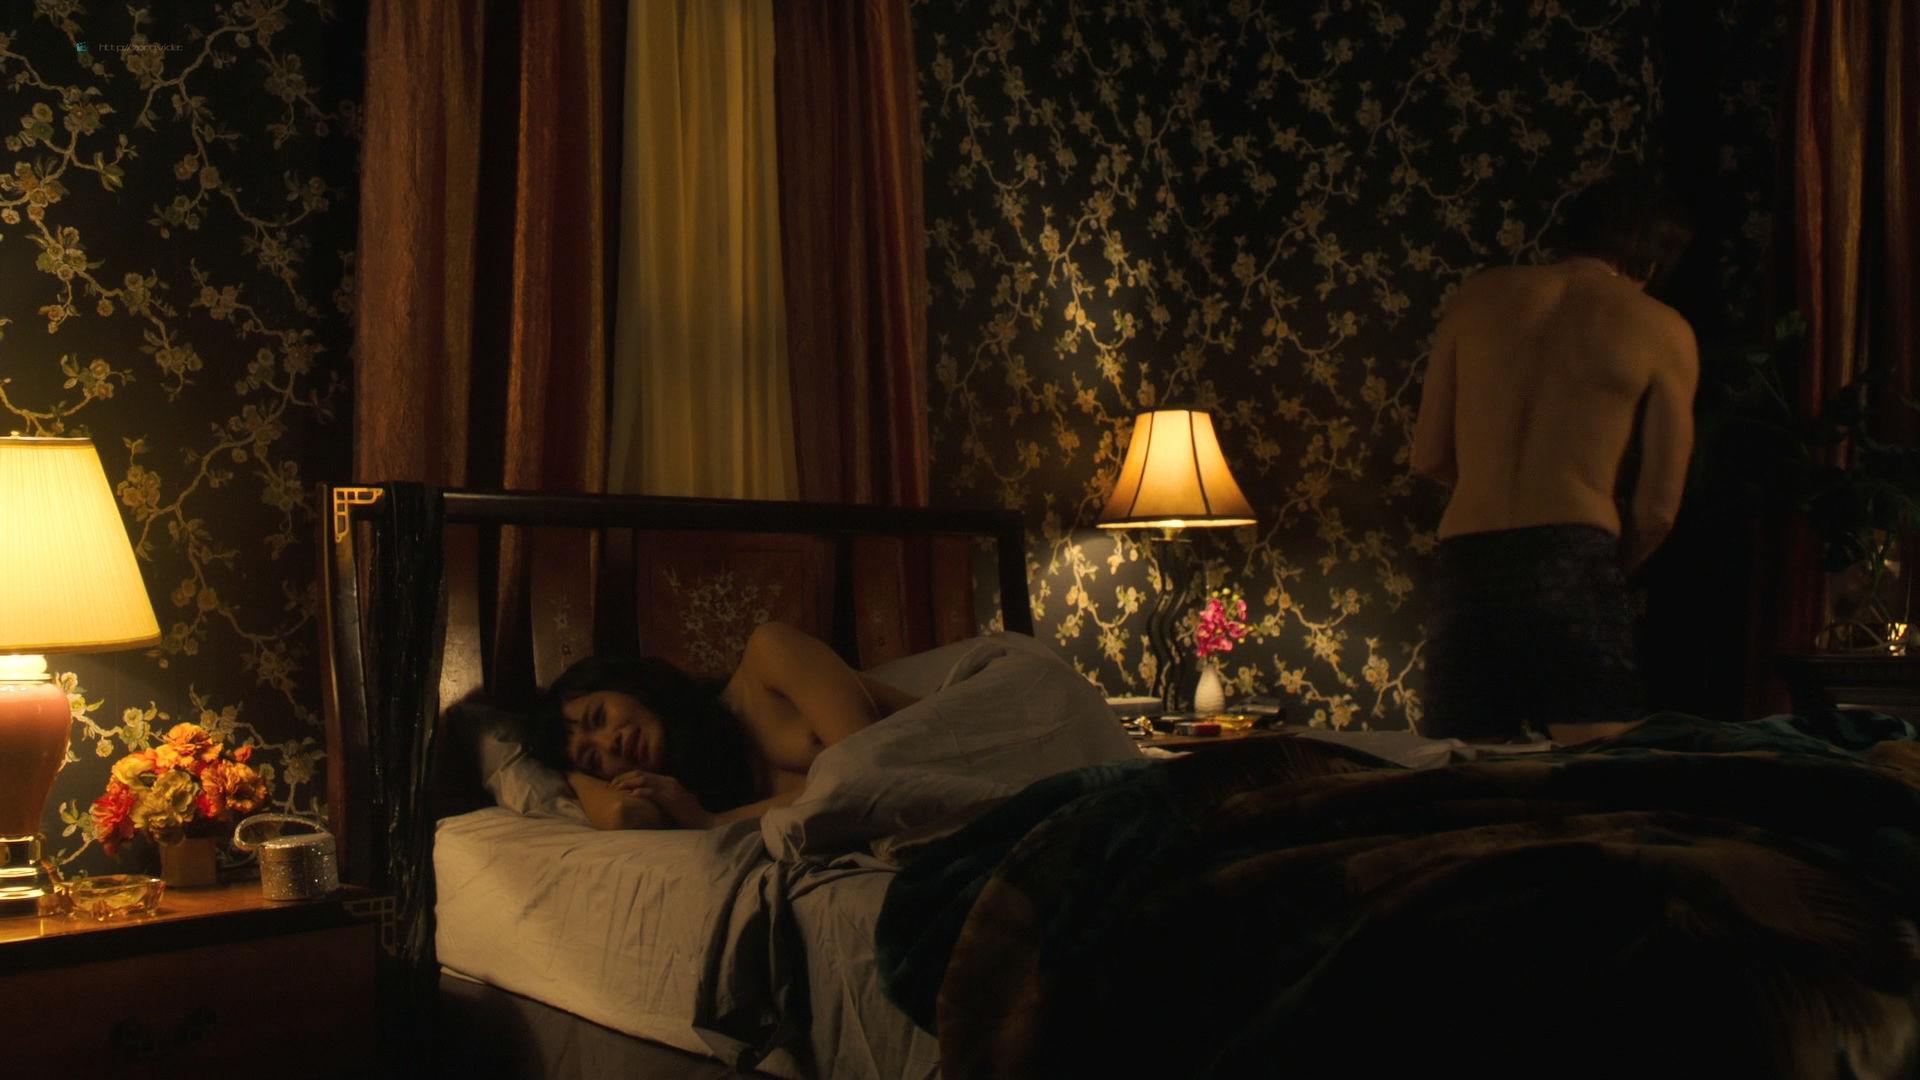 Charlene Almarvez nude topless - City on a Hill (2019) s1e5 HD 1080p (5)